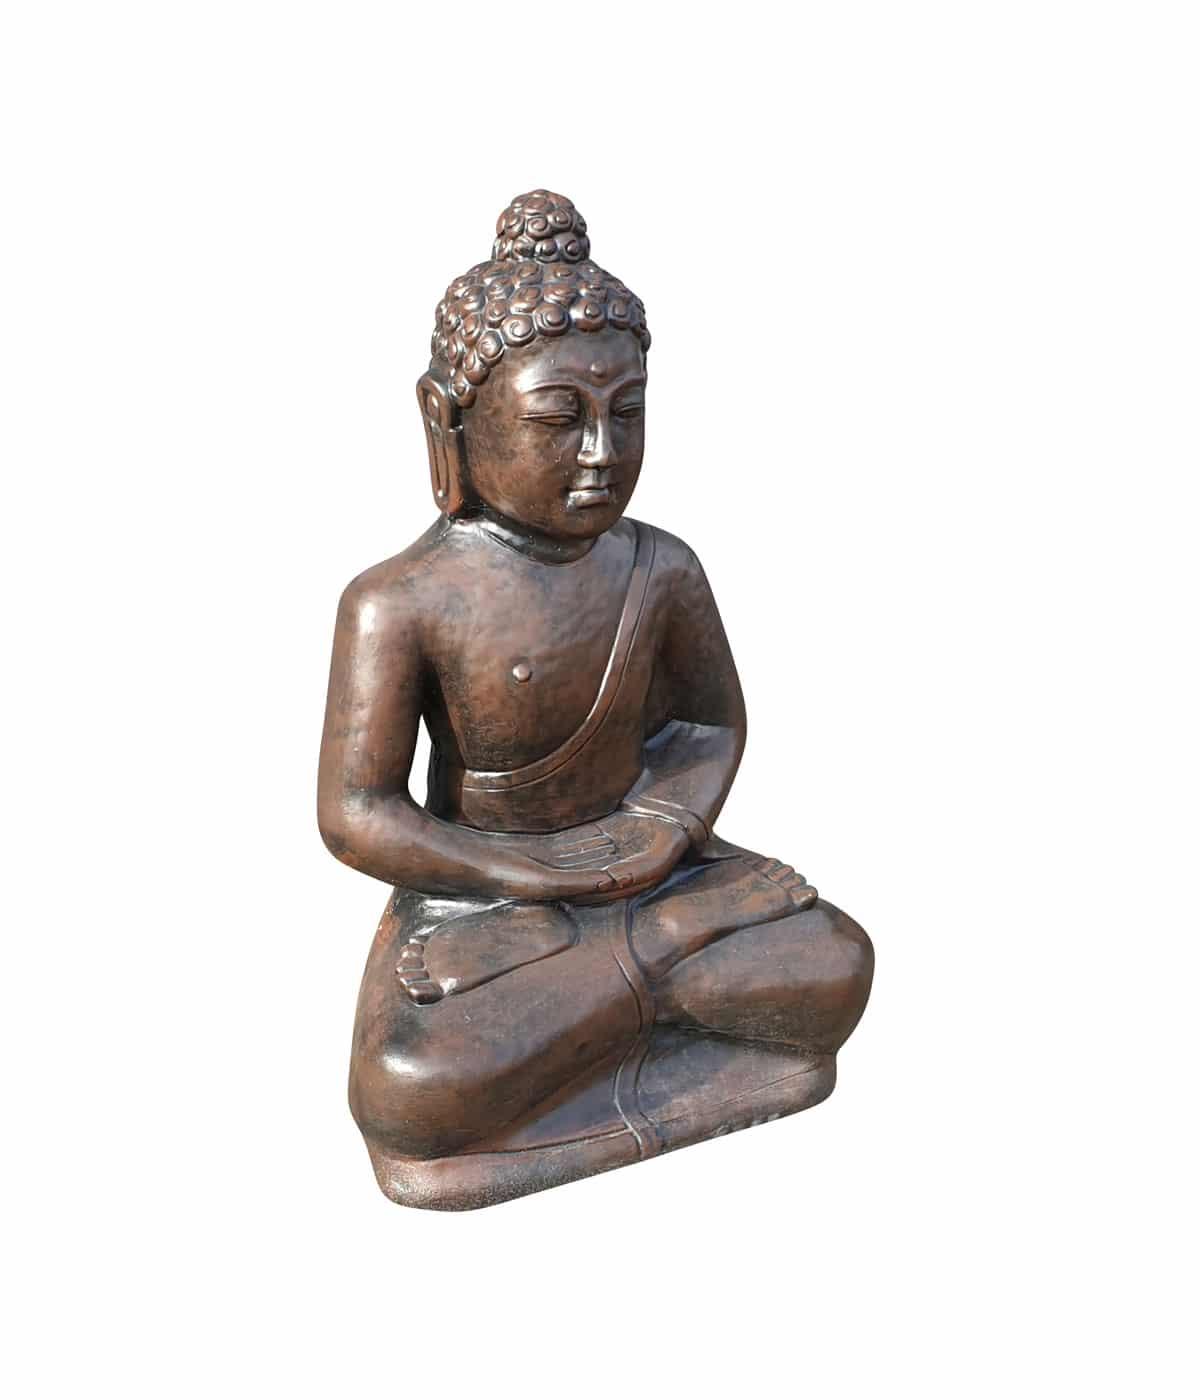 Boeddha Beeld Beton.Unieke Boeddha Zit Beton 80 Cm Hoog Boeddha Beelden Com